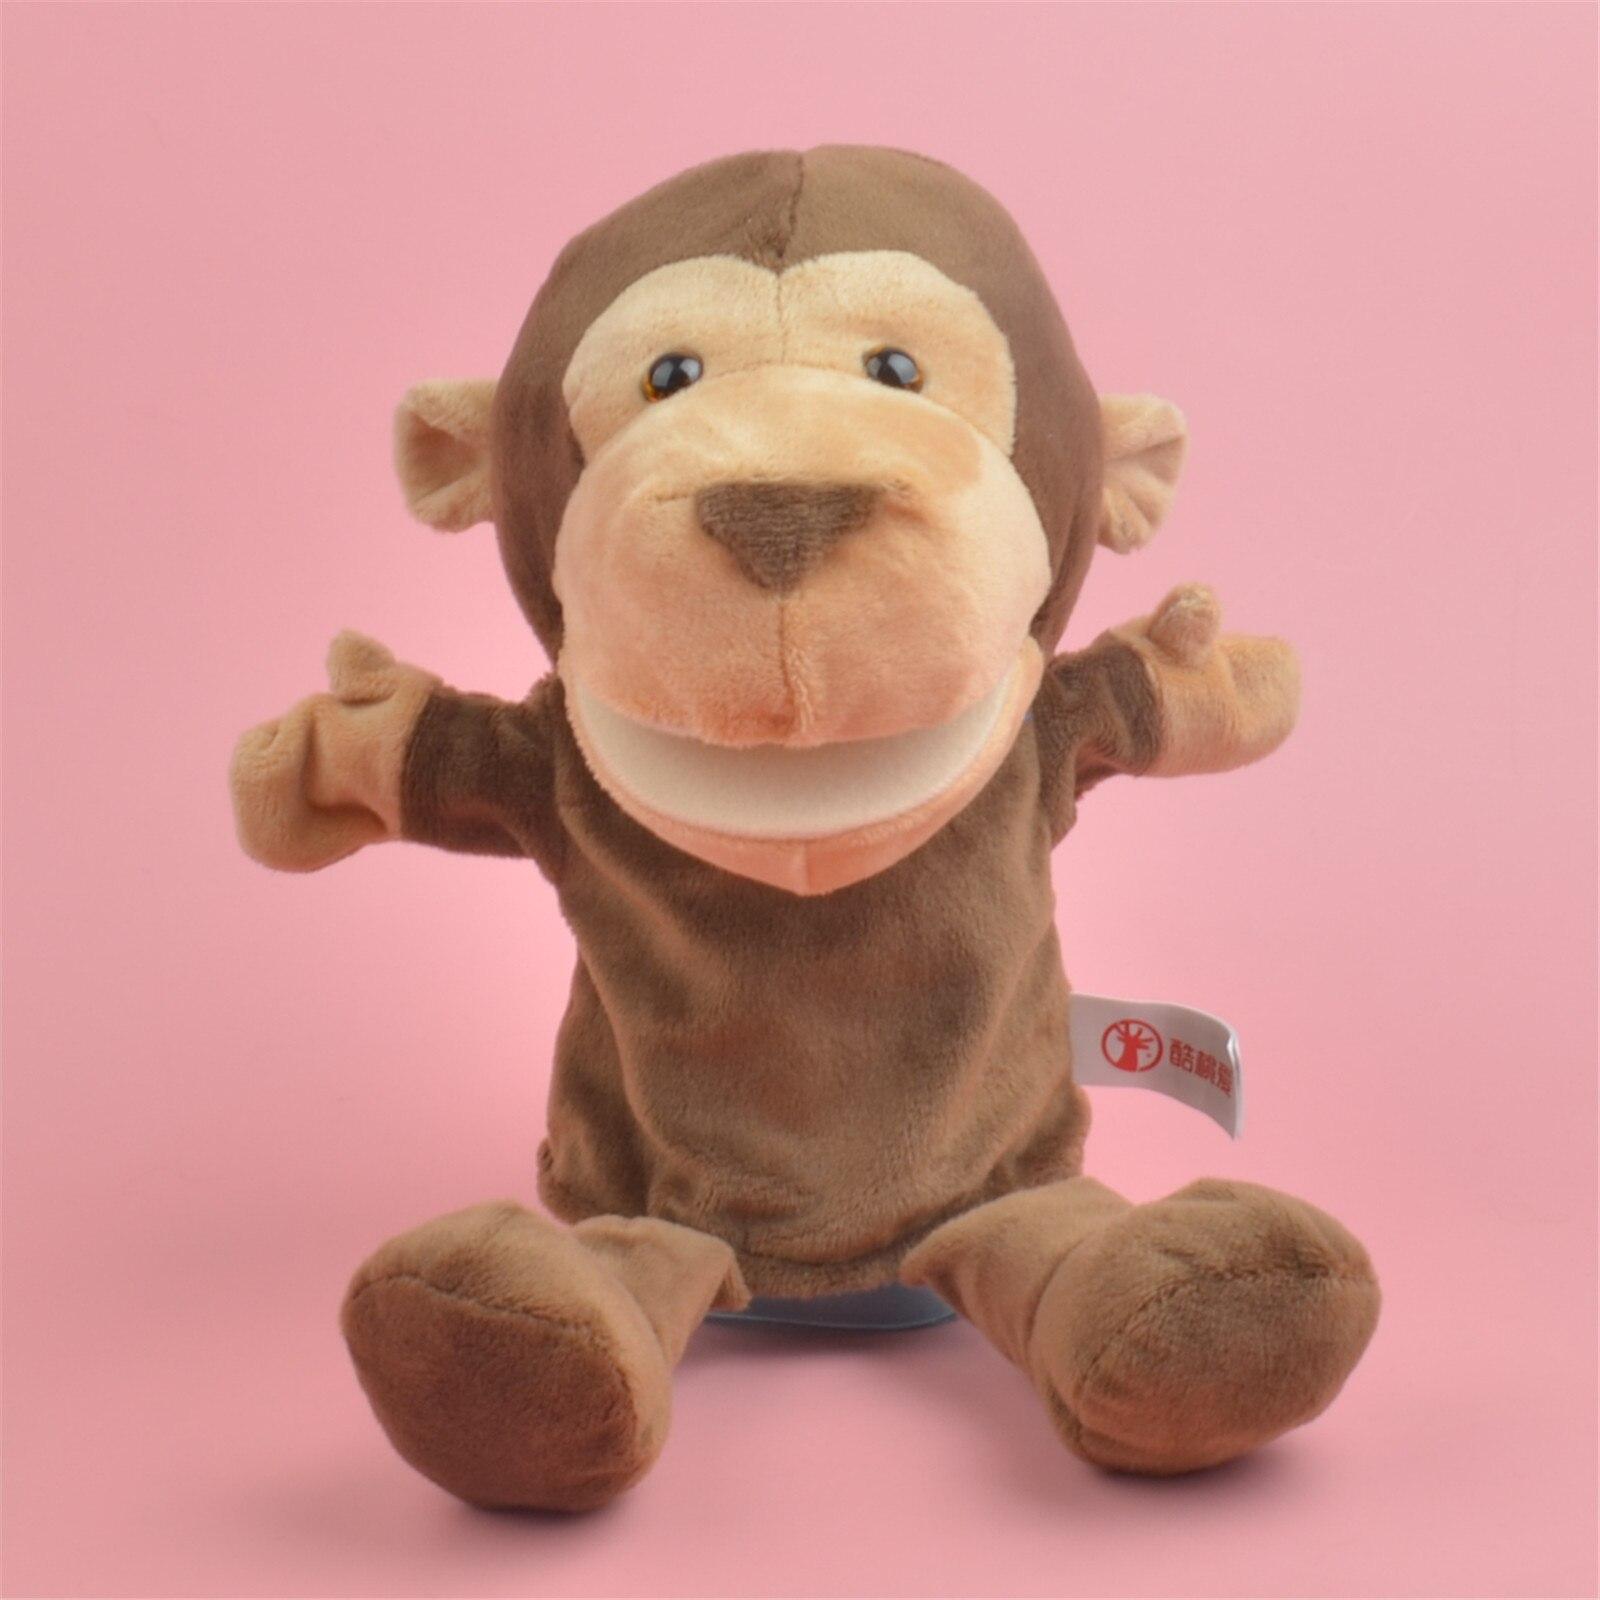 25-30cm Plush Hand Orangutans King Kong Puppets Simulation Animal Puppets Kids Gifts Monkey Hand Puppet Parent-child Game